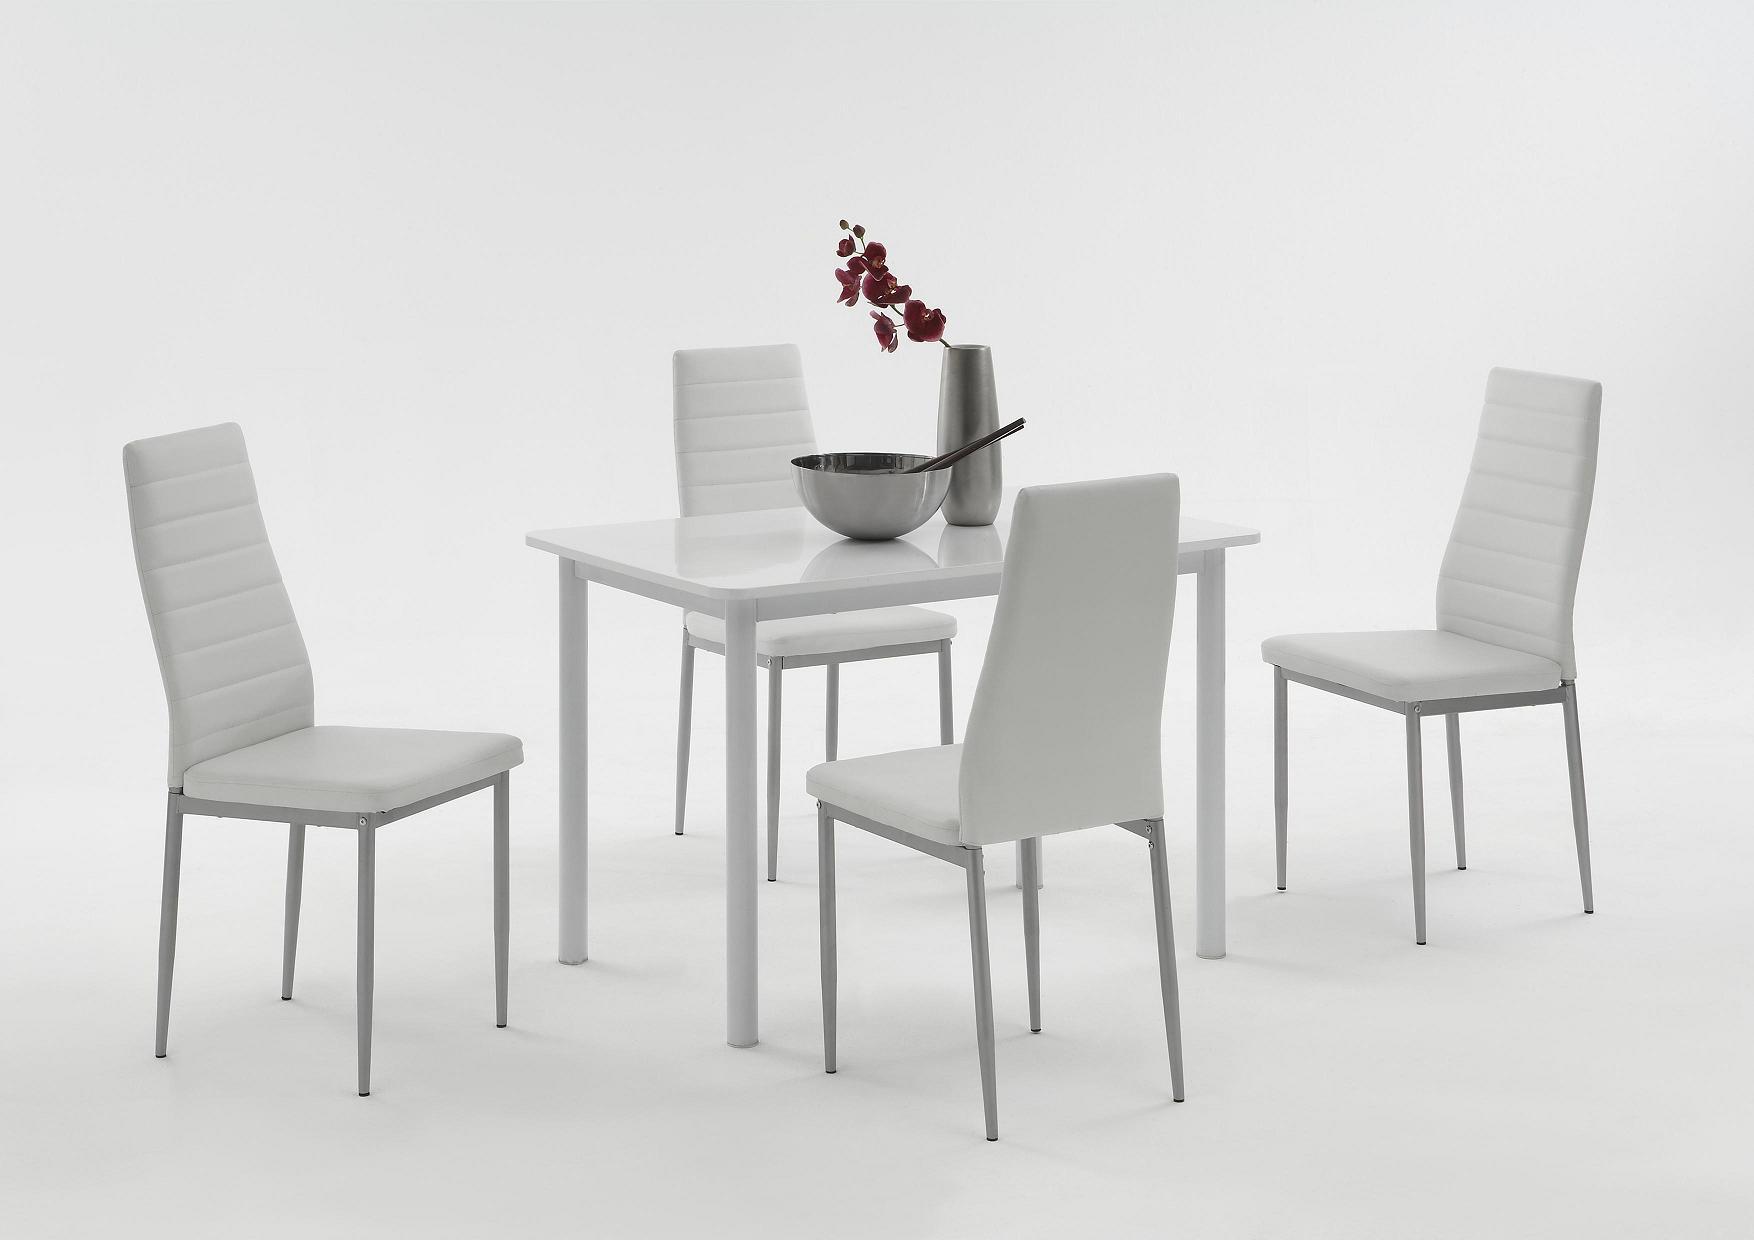 2 Stühle=Set Vierfussstuhl Stuhl Simone S 13 Kunstleder Weiß